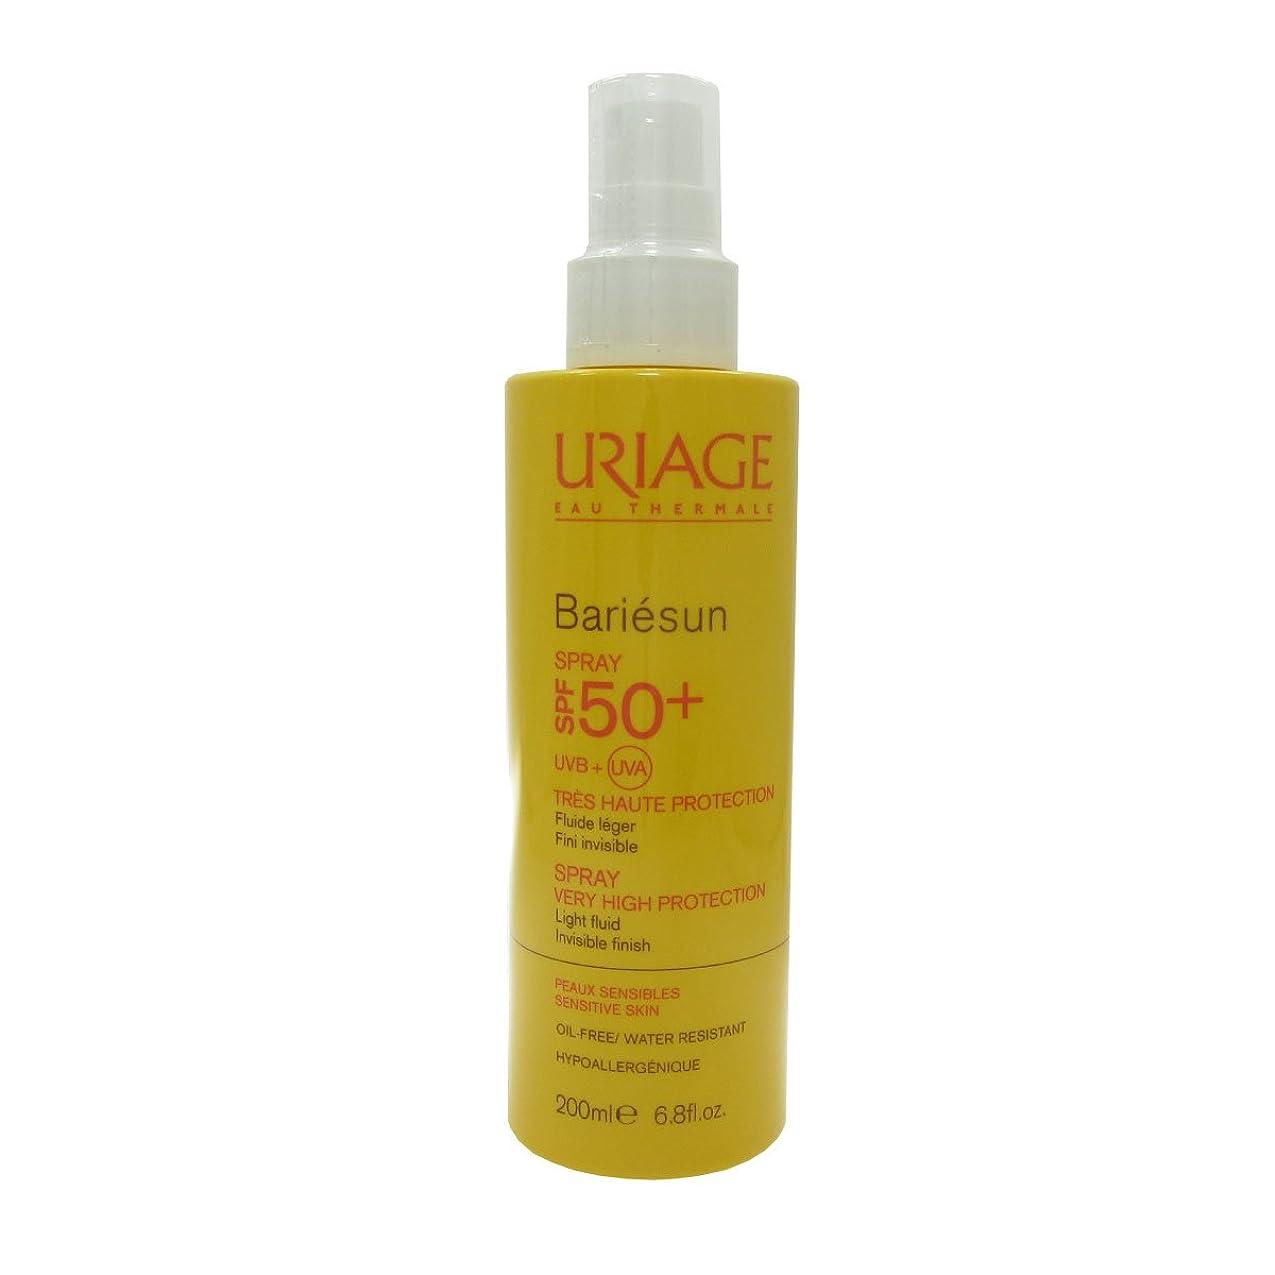 征服する従者所有権Uriage Bariesun Spray Spf 50+ 200ml [並行輸入品]